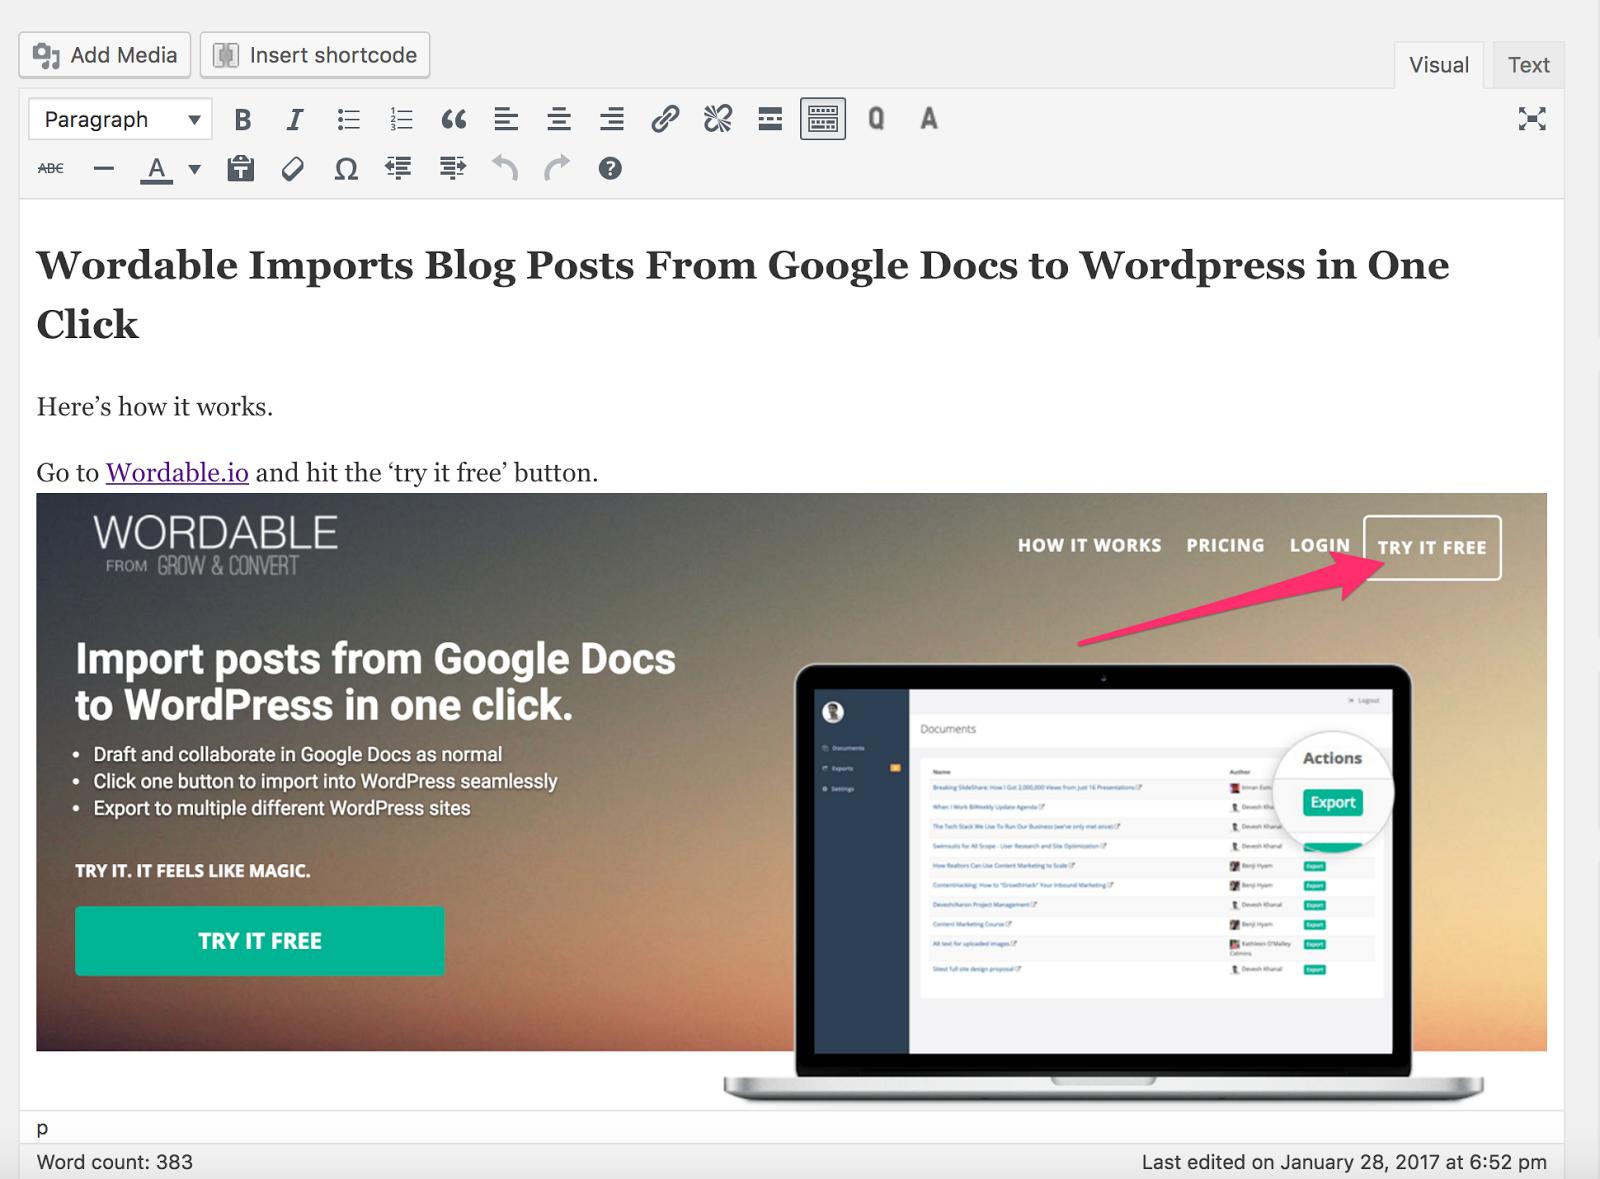 bulkuploadimages wordpress wordable